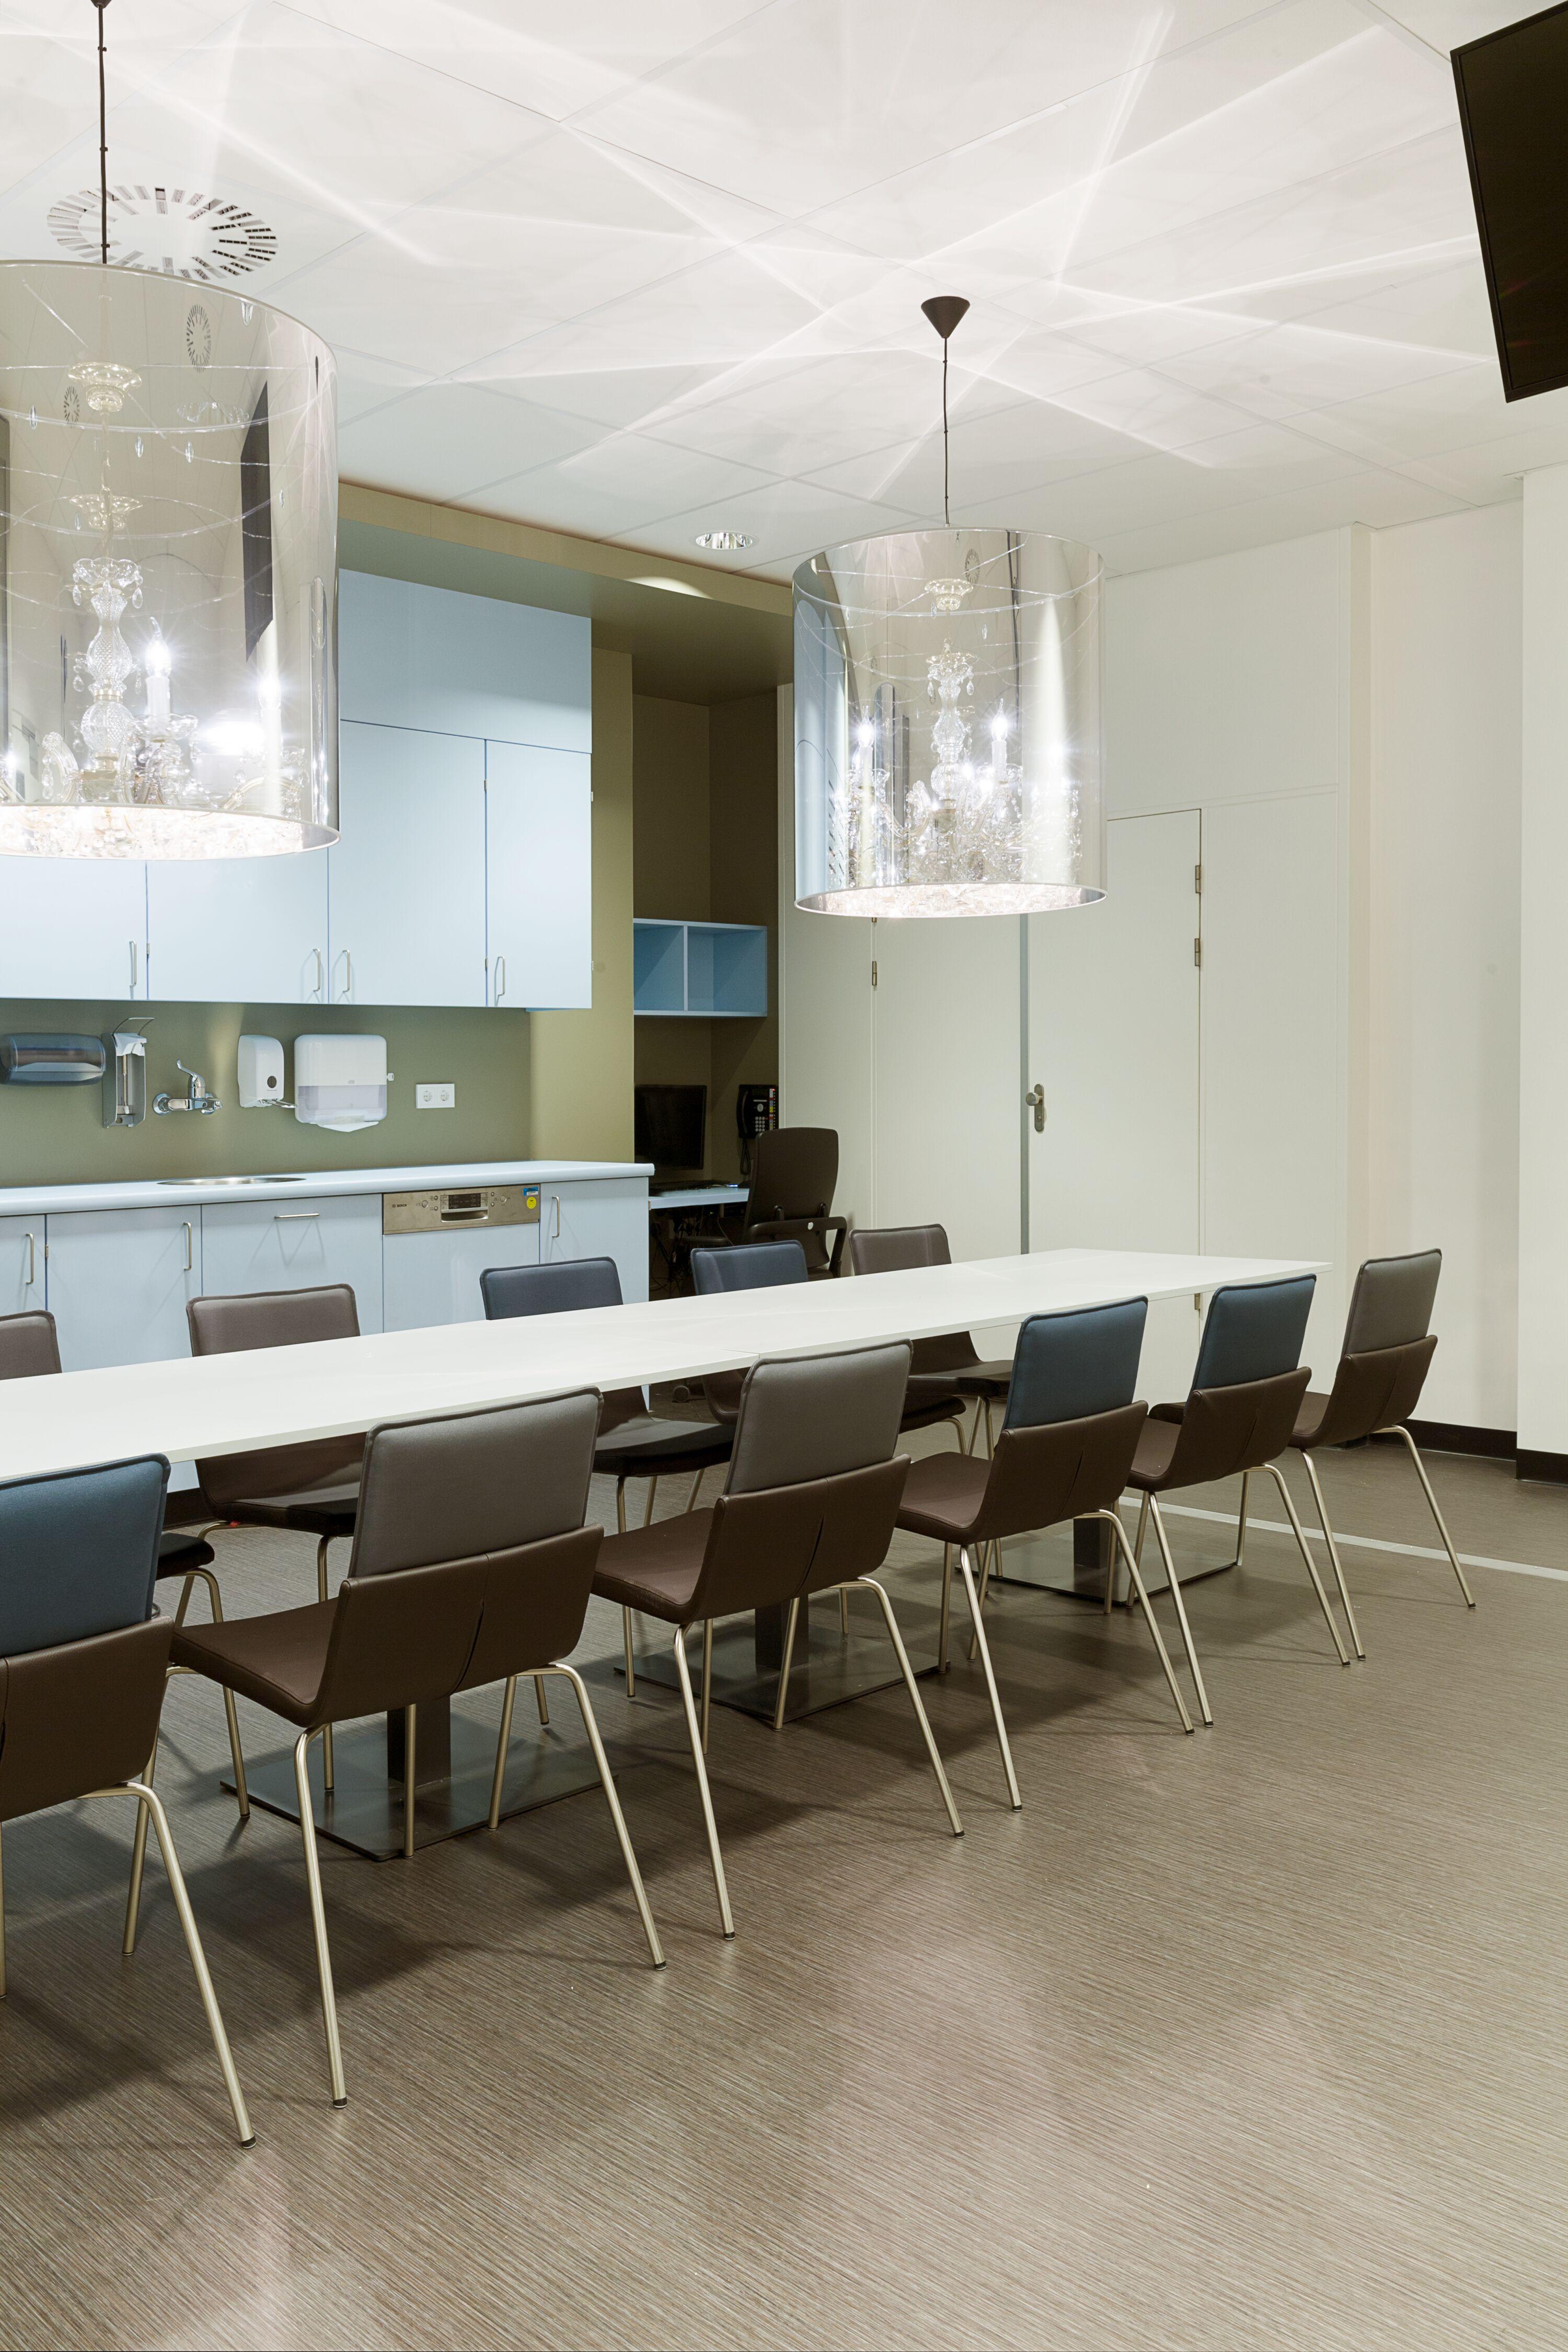 Gispen healthcare project AMC Academic Medical Center in Amsterdam K5B9972